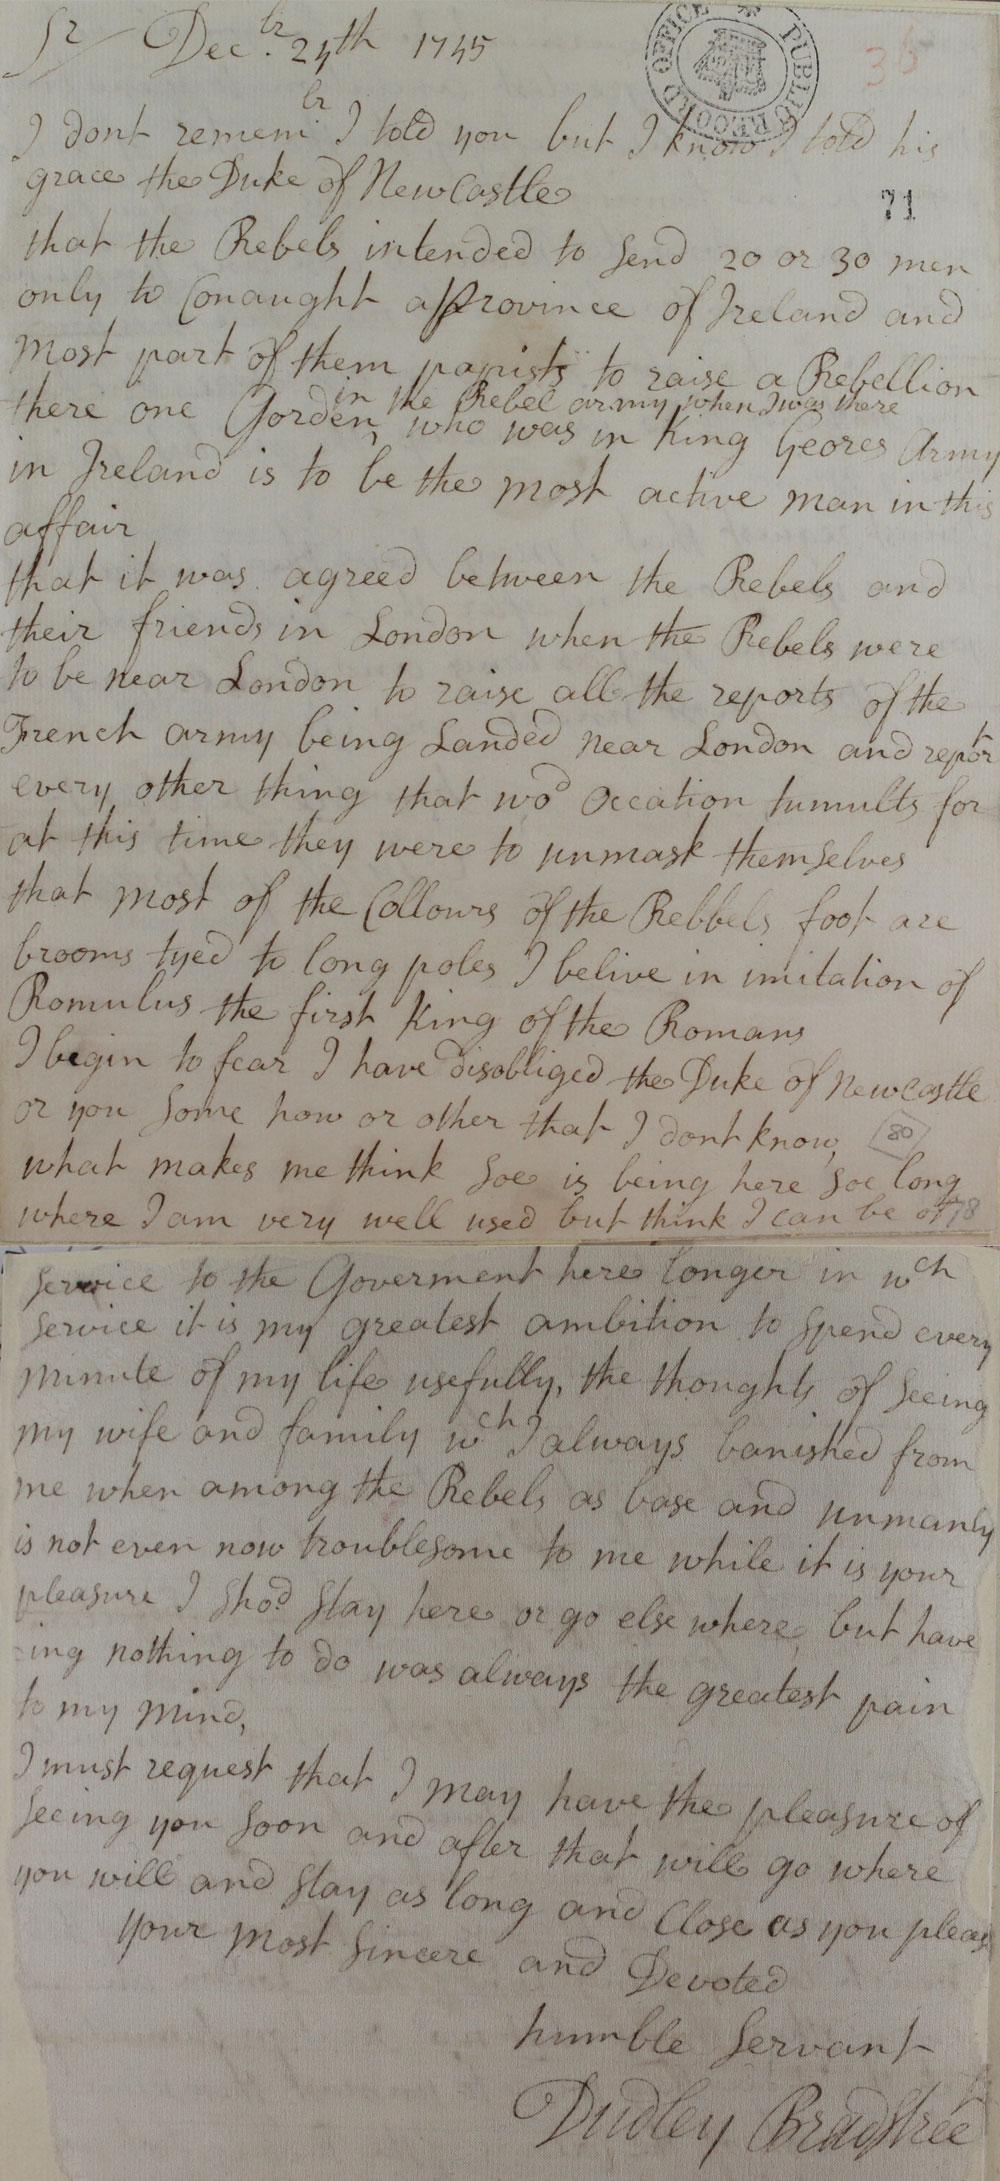 Intelligence sent to Duke of Newcastle (SP 36/78/71)